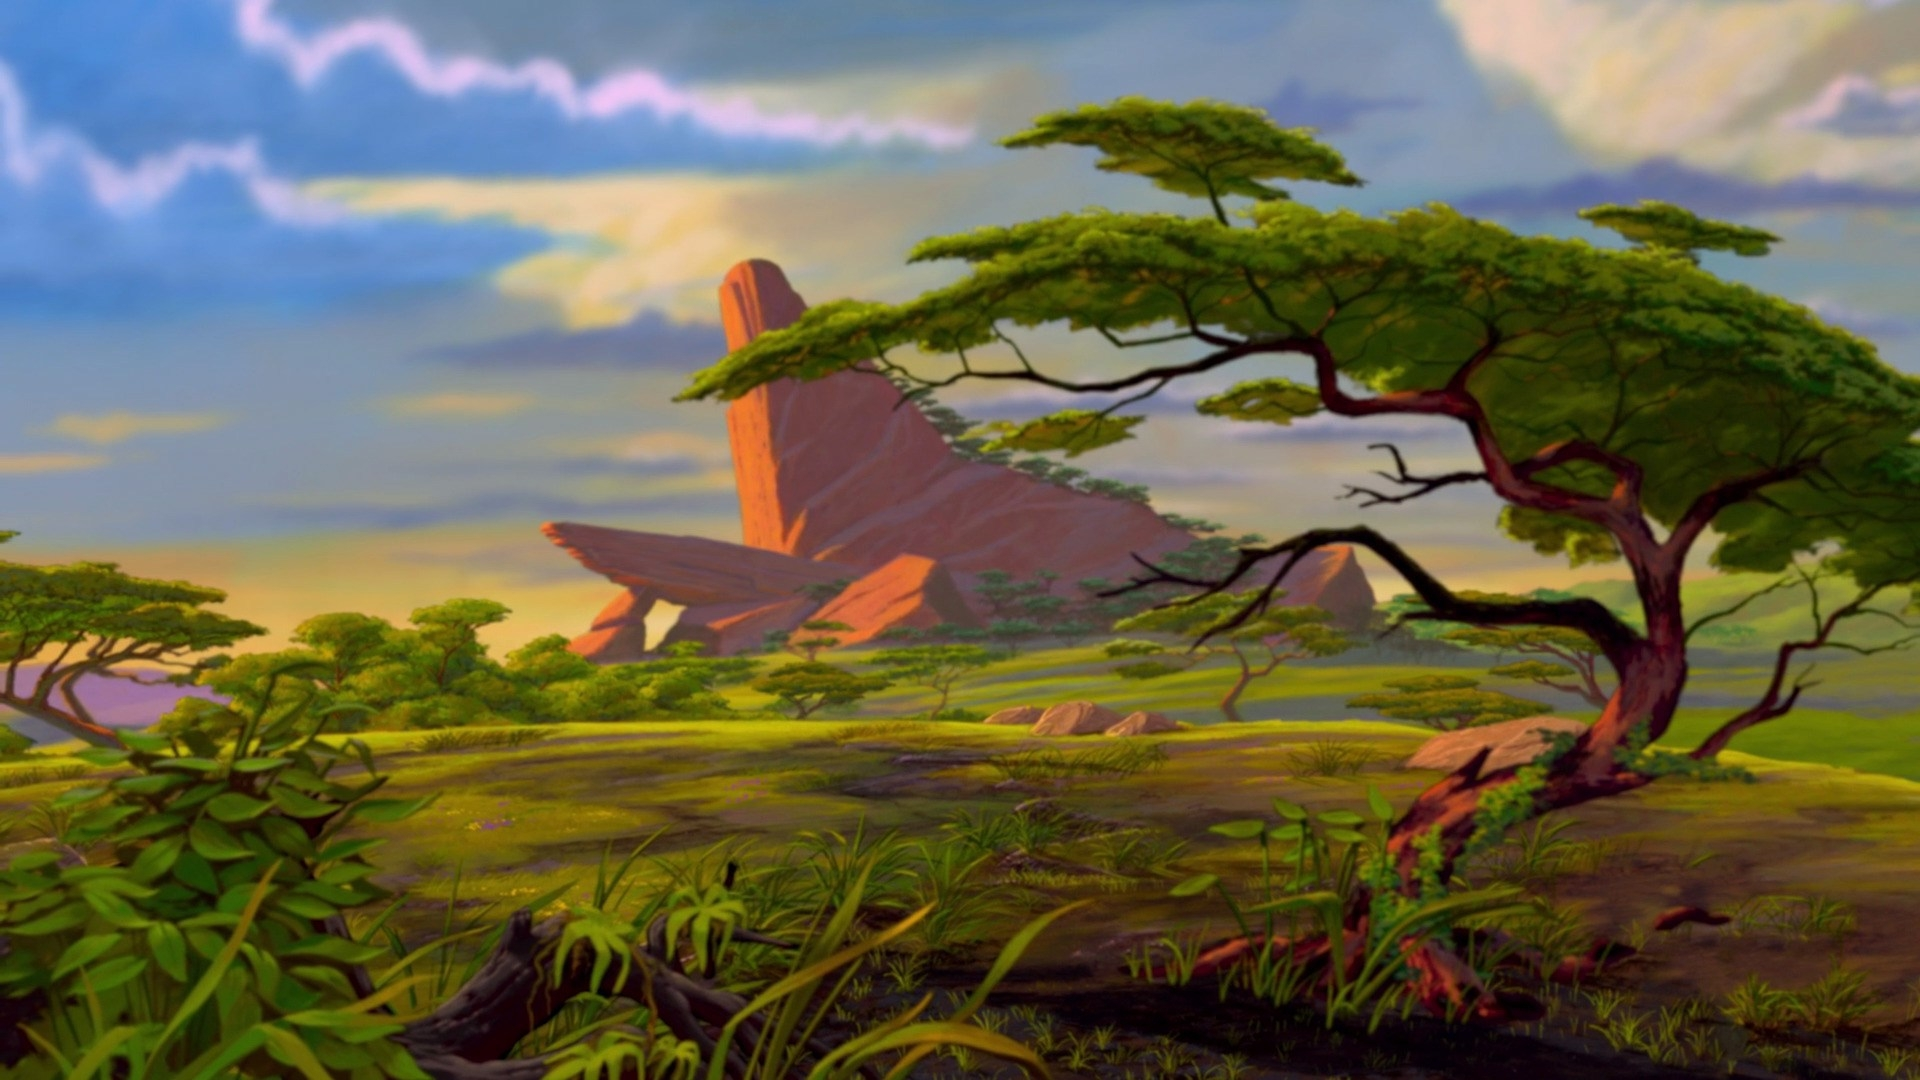 Lejonkungen (Disney's The Lion King) (@kingshotelny) Cover Image